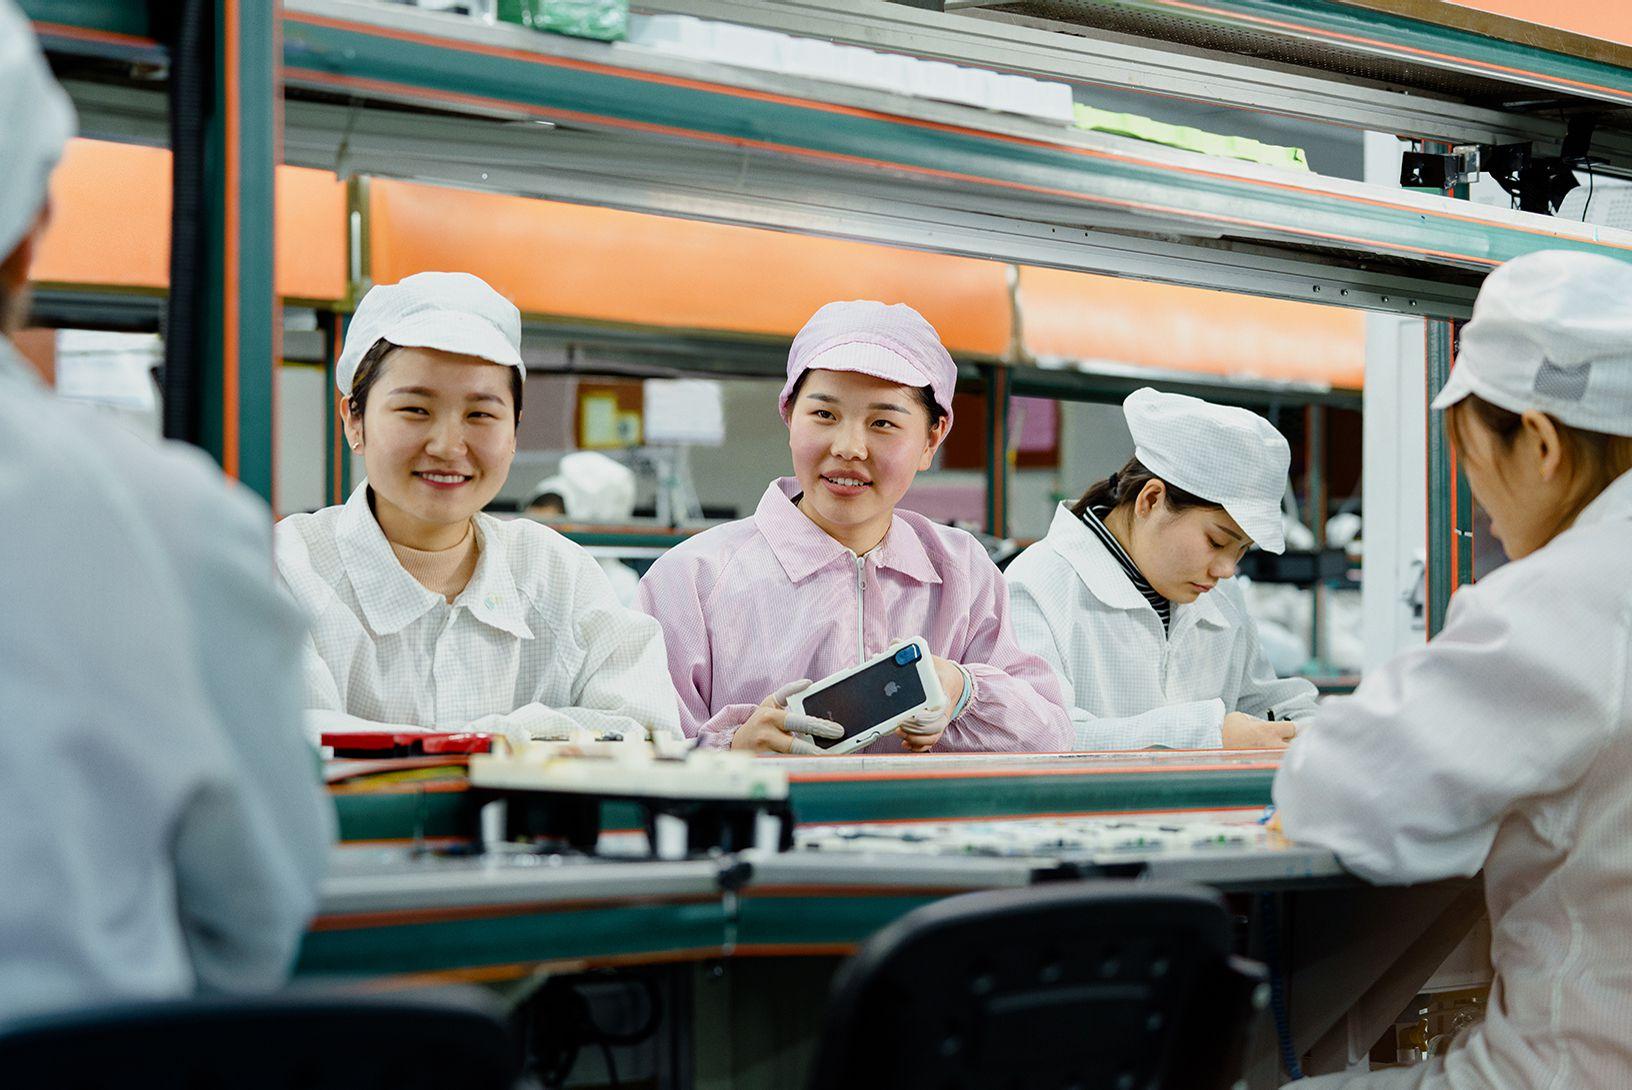 Apple SR Report 2019 women assembly iphone 03062019 big jpg large 2x.'